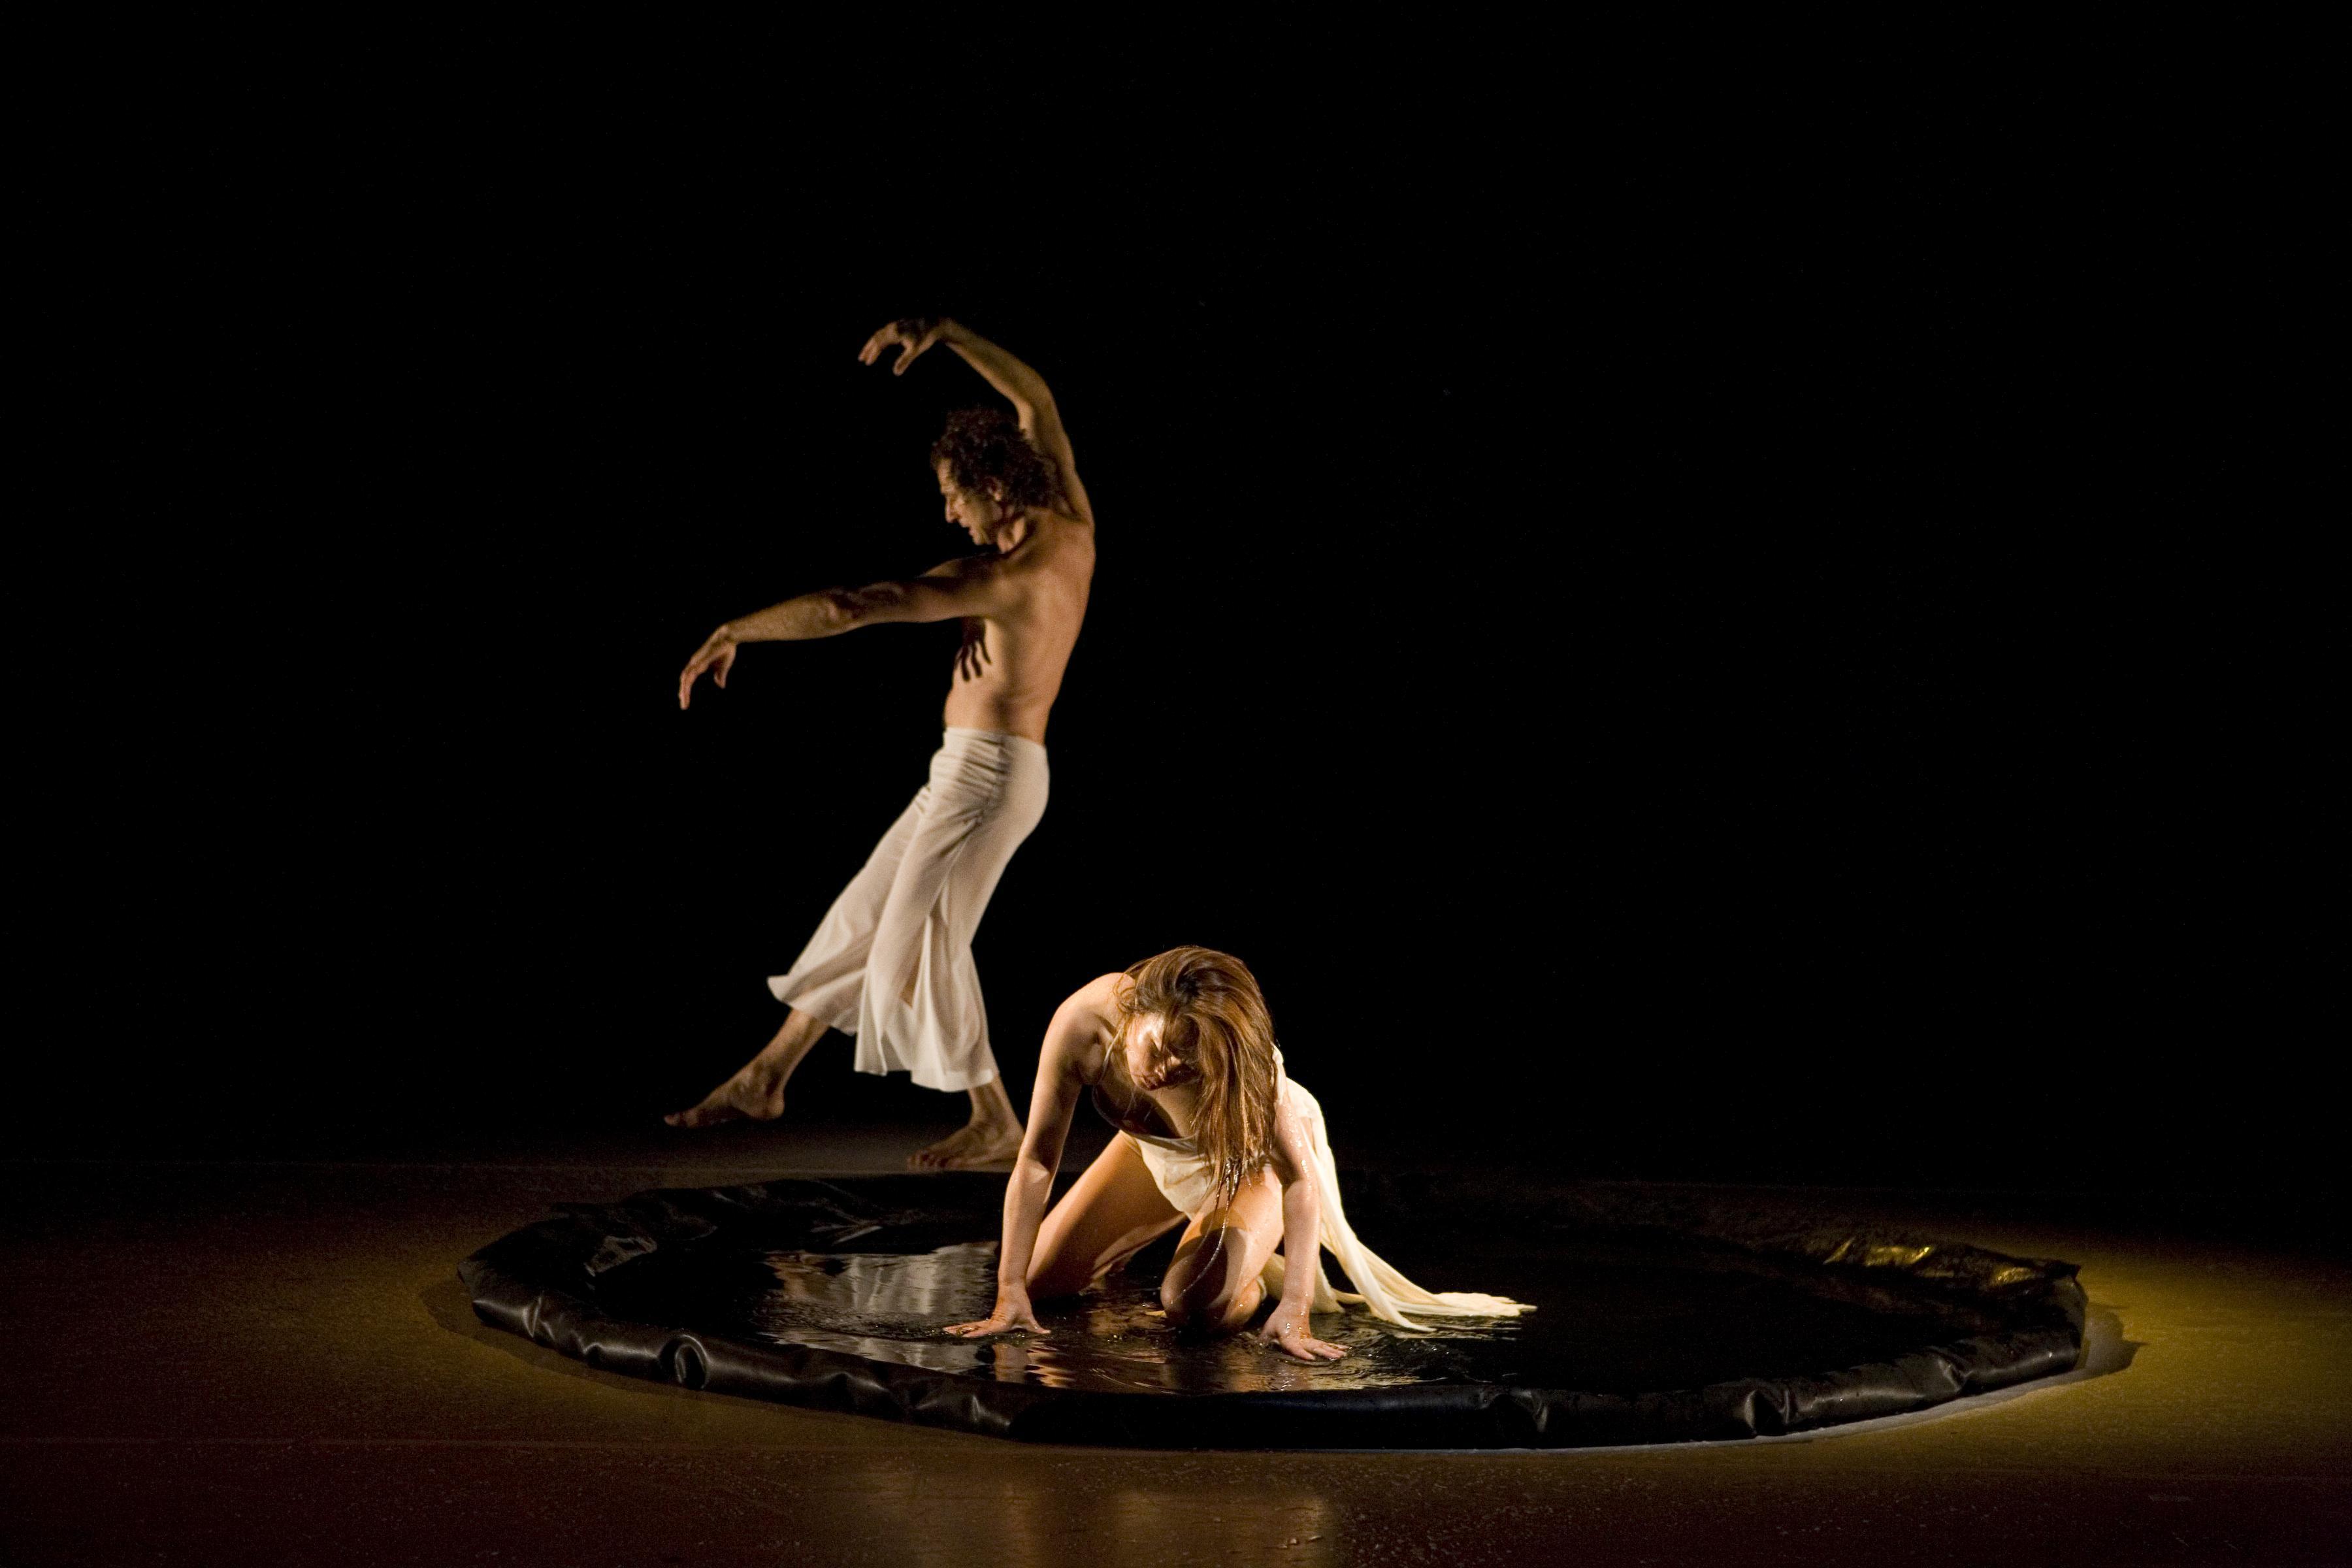 SSOOT dance by Young Soon Kim & Pascal Rekoert